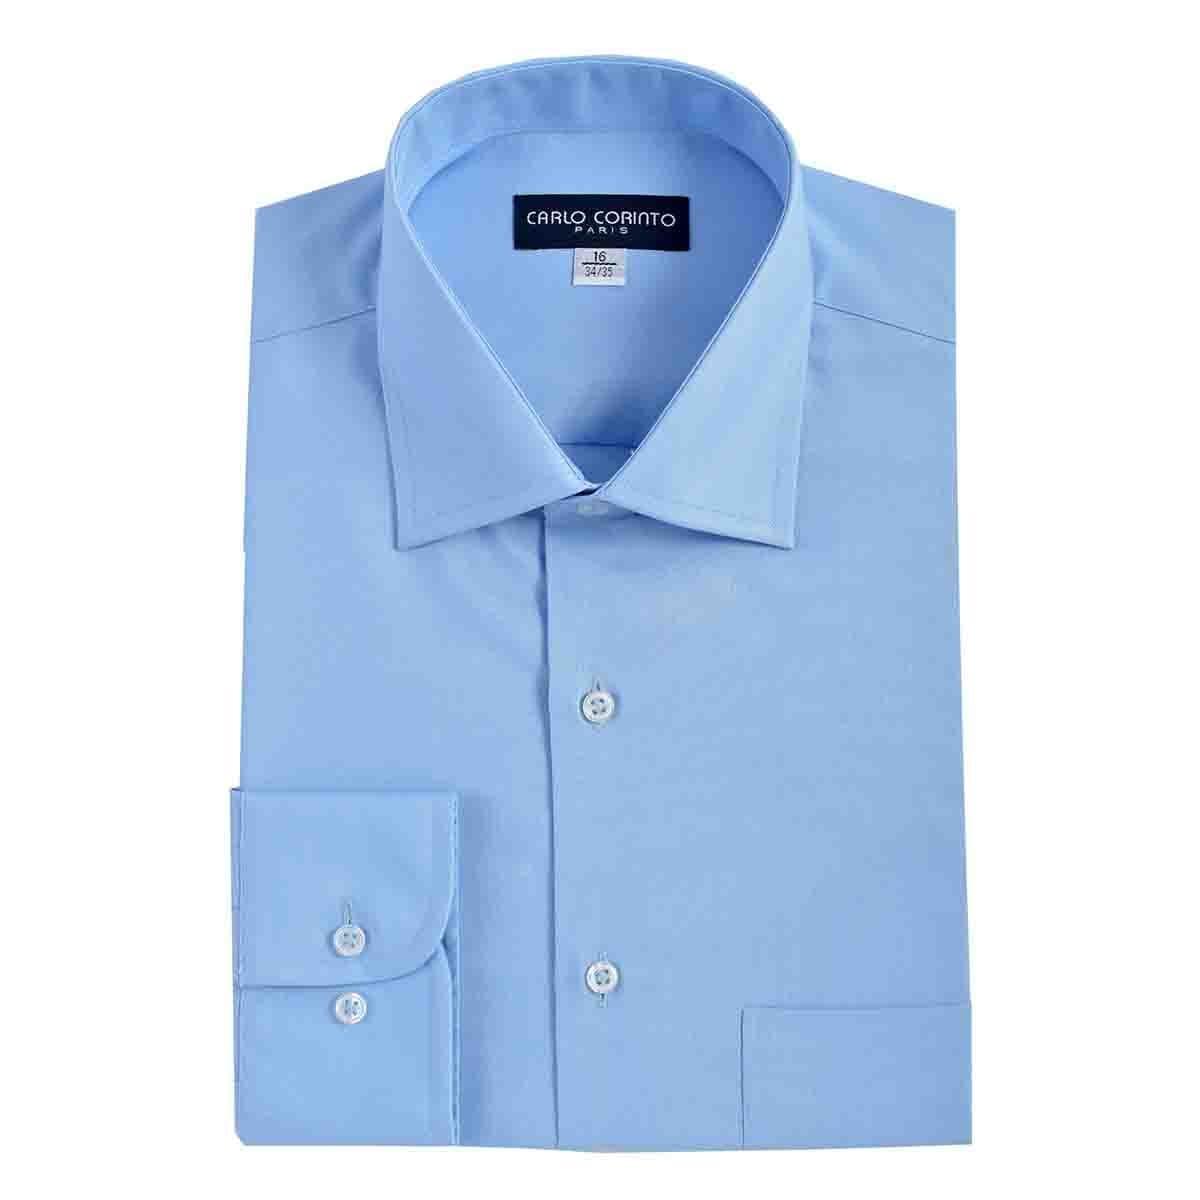 Camisa de Vestir Tradicional Azul Secf 08 Carlo Corinto